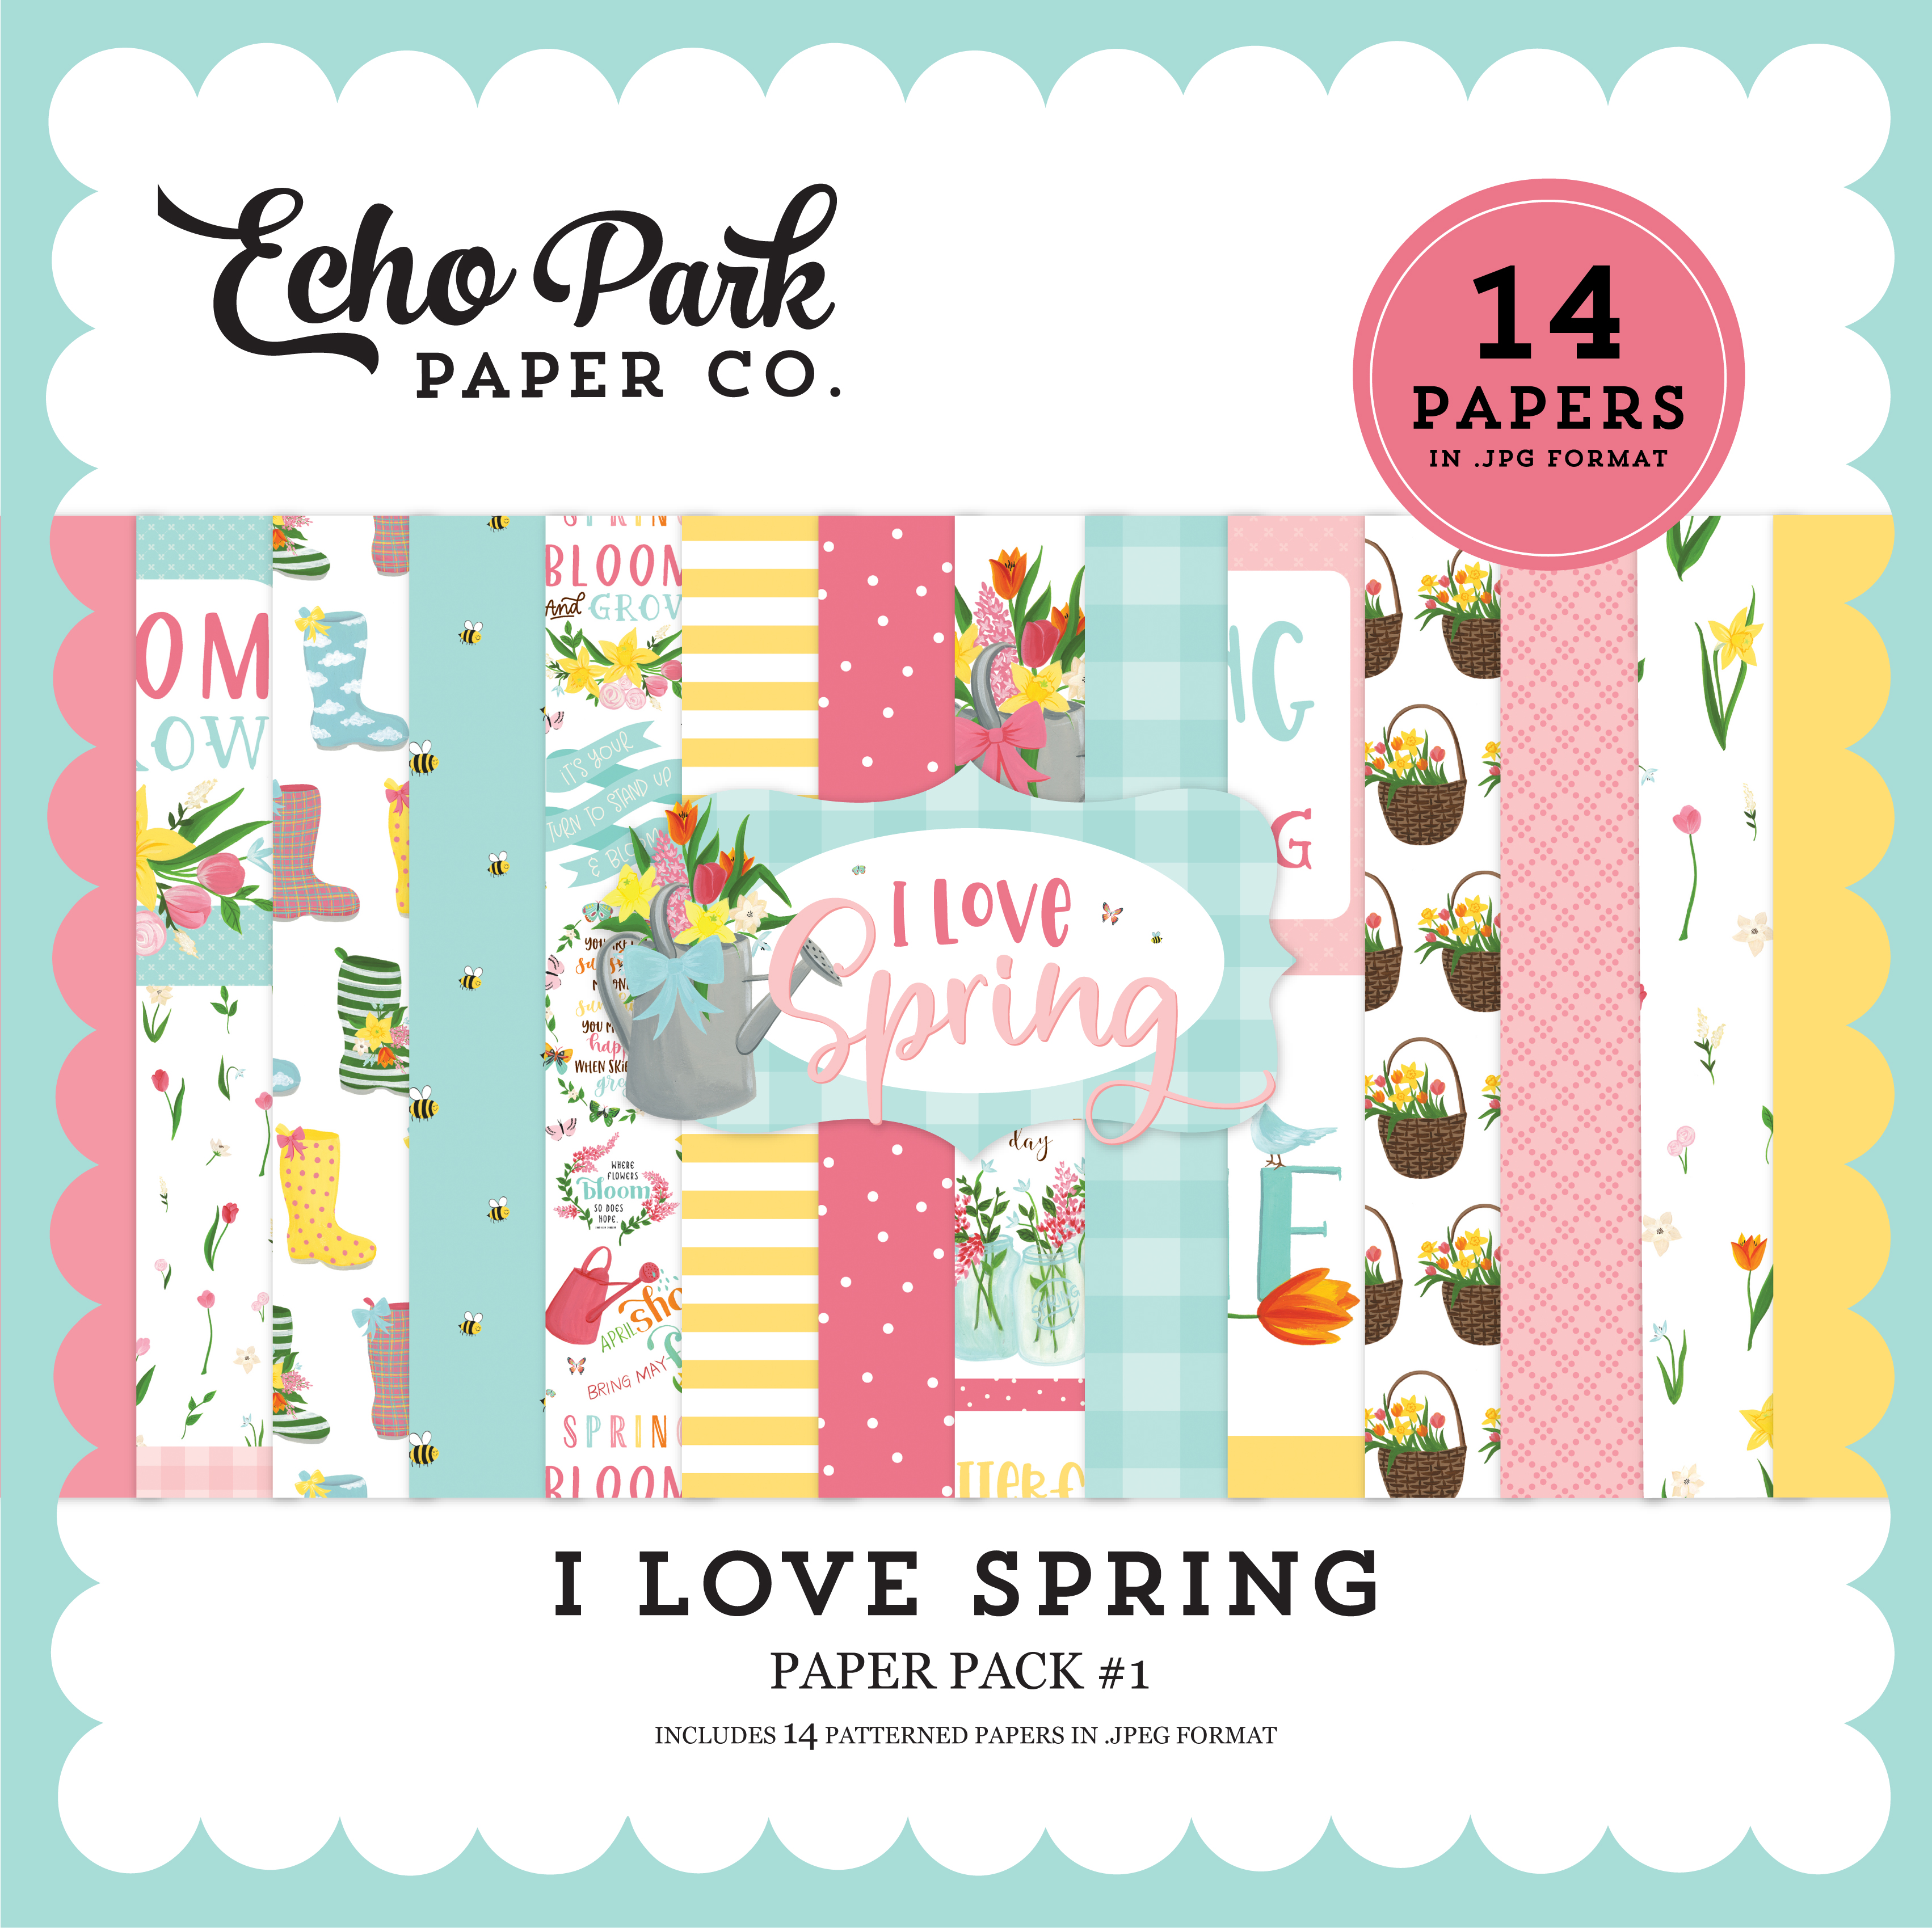 I Love Spring Paper Pack #1